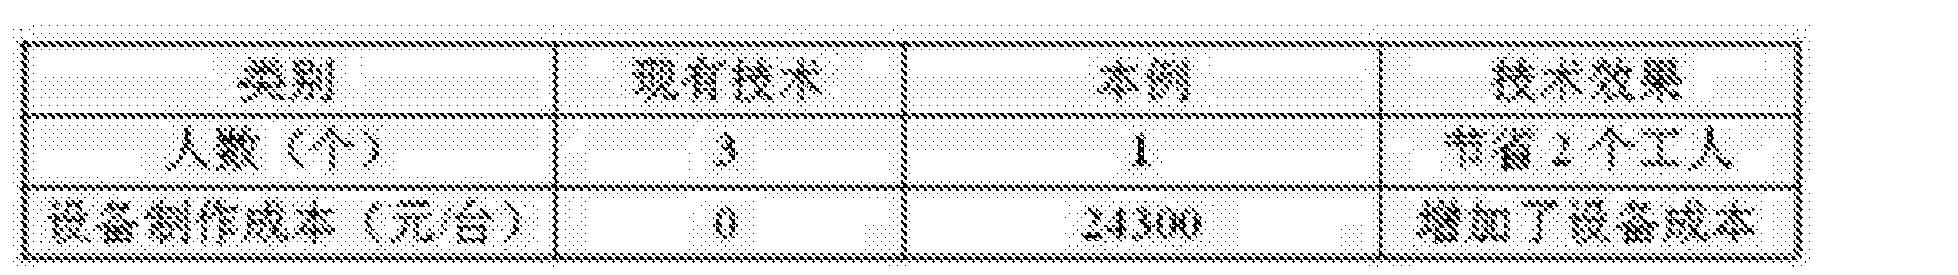 Figure CN204936206UD00051